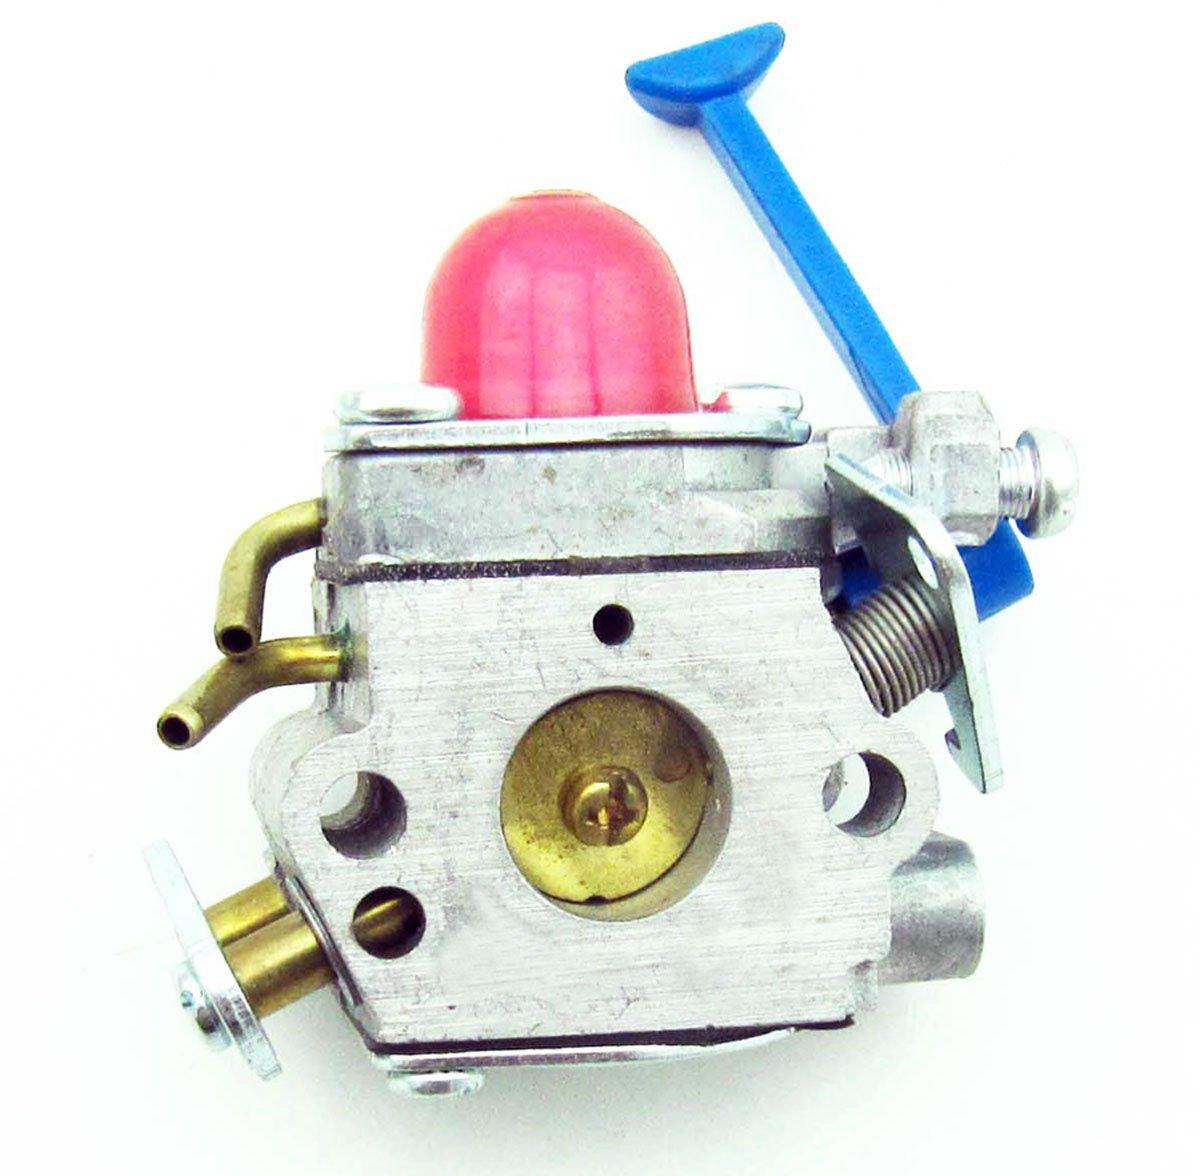 hight resolution of get quotations new husqvarna trimmer 545081848 zama carburetor c1q w40a 128c 128l 128ld 128r 128rj